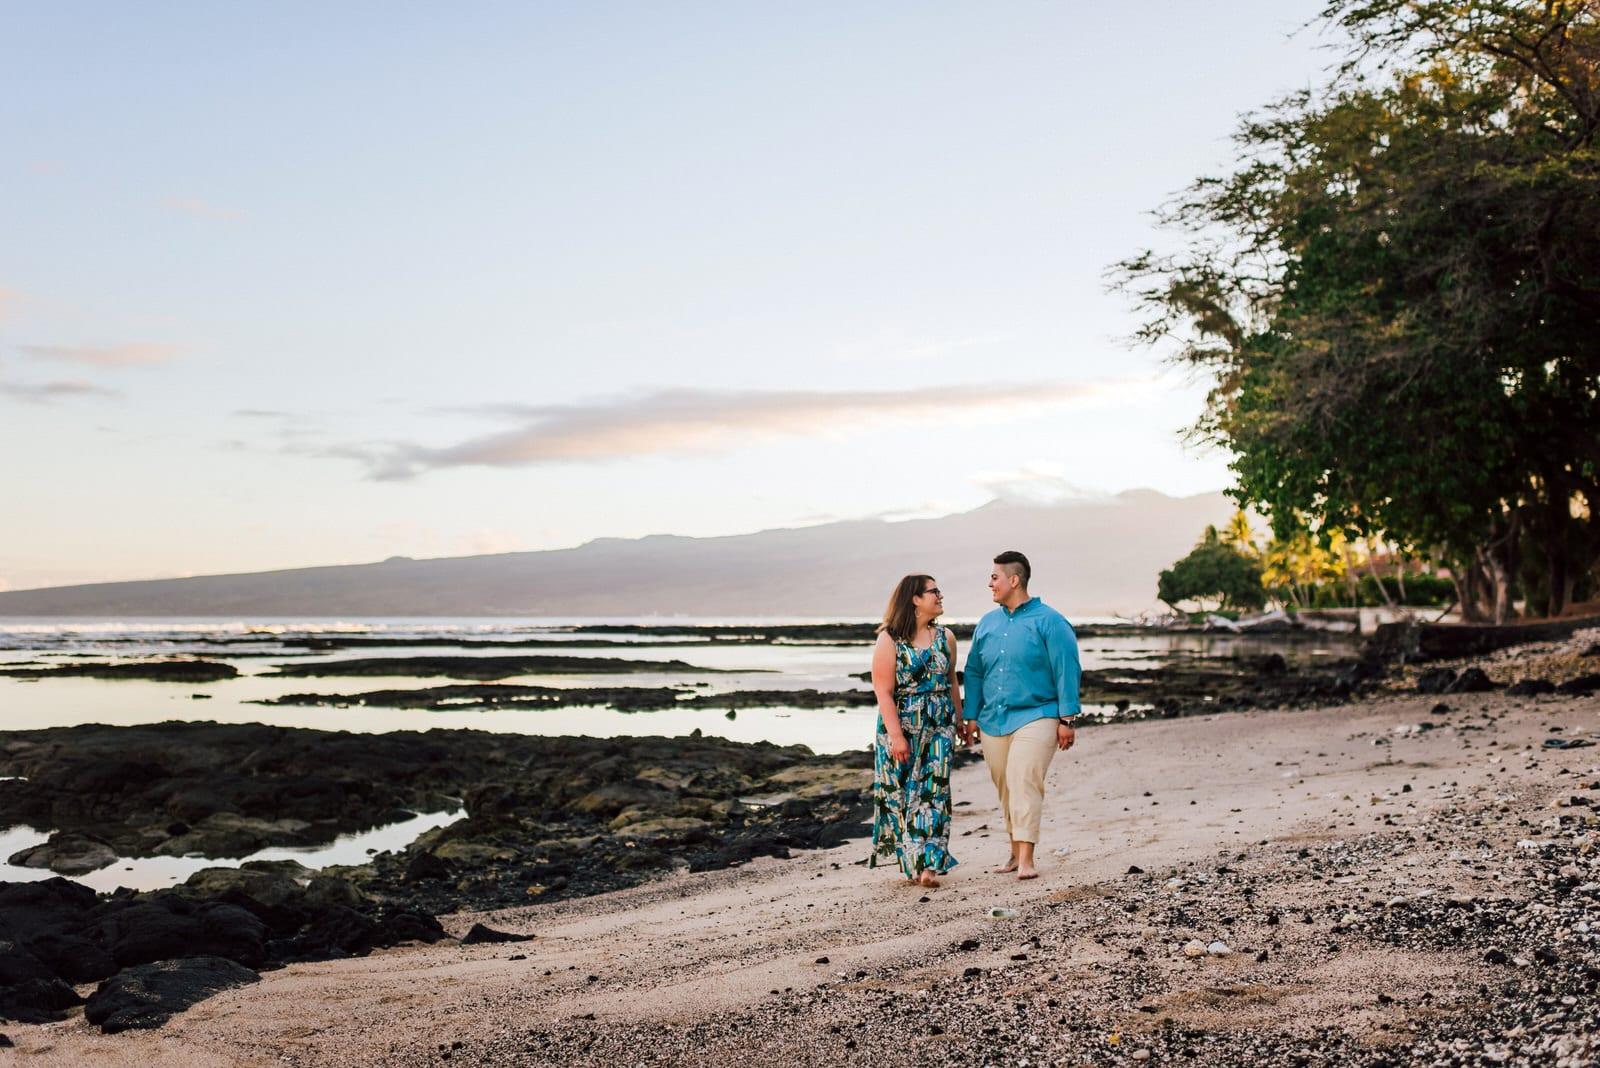 hawaii-photographer-lgbt-sunrise-honeymoon-8.jpg